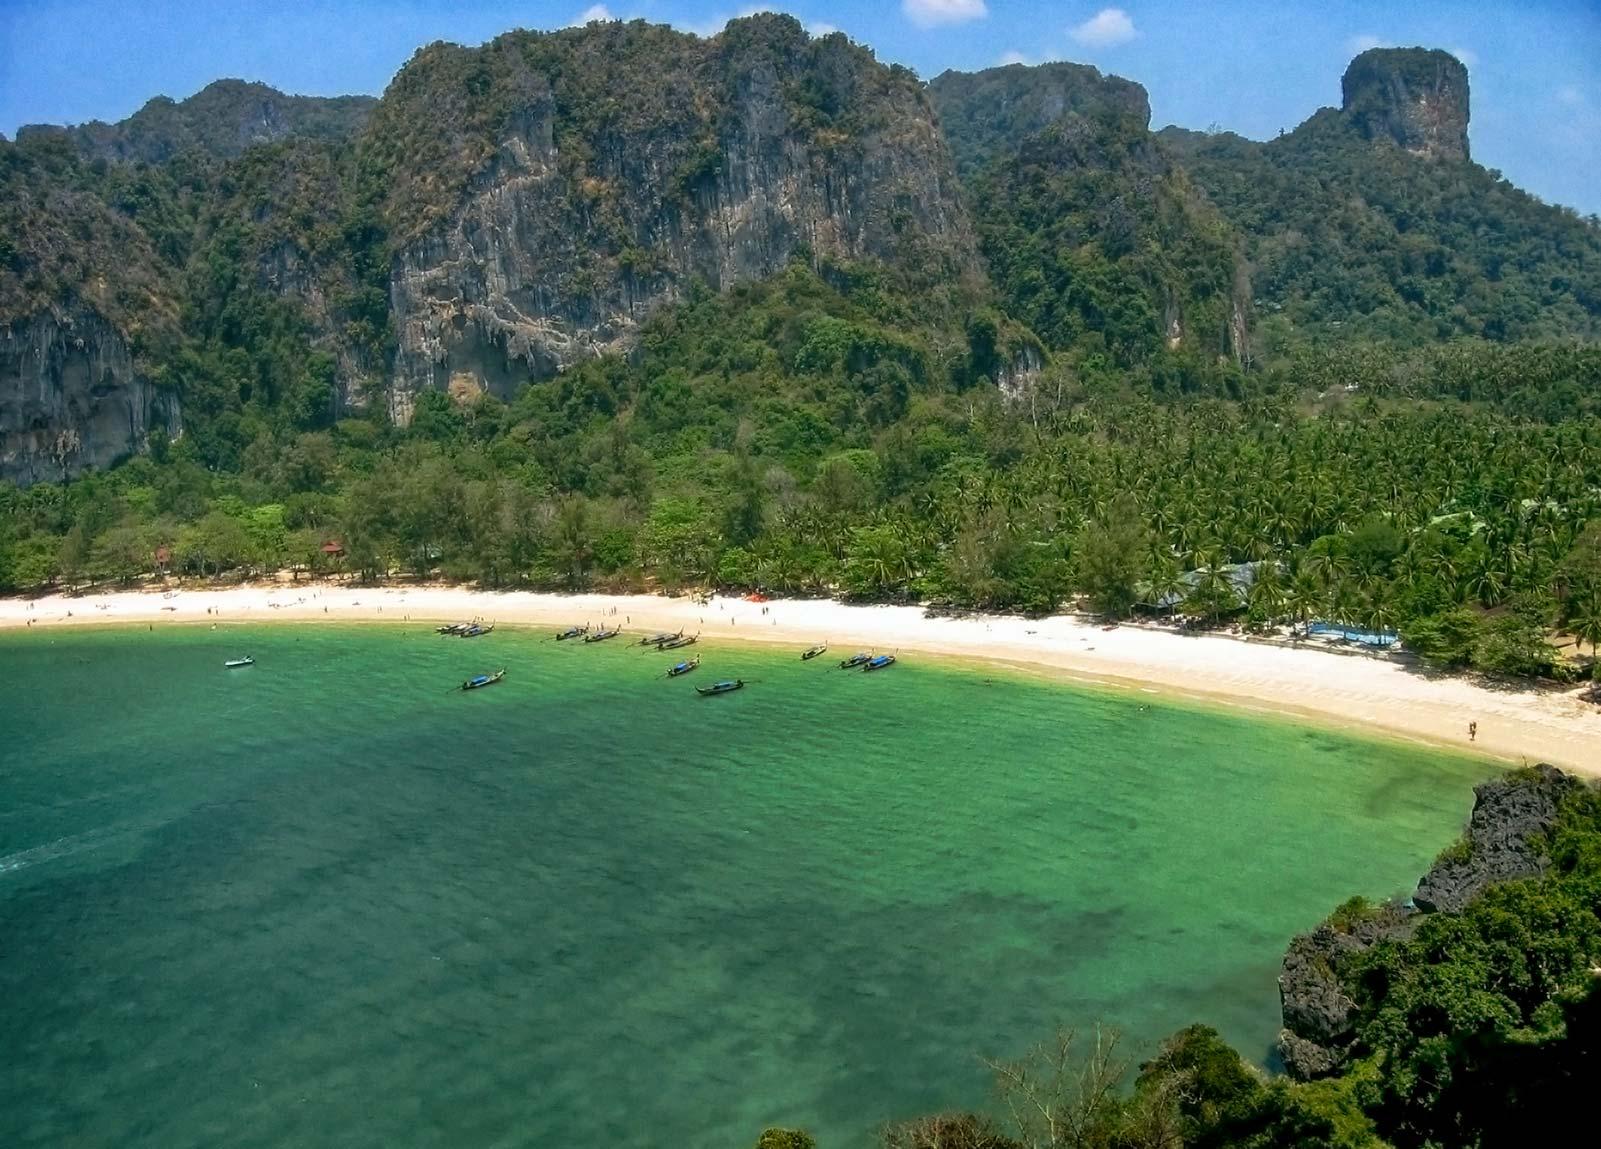 Фото тайланда о.пхукет с пляжами